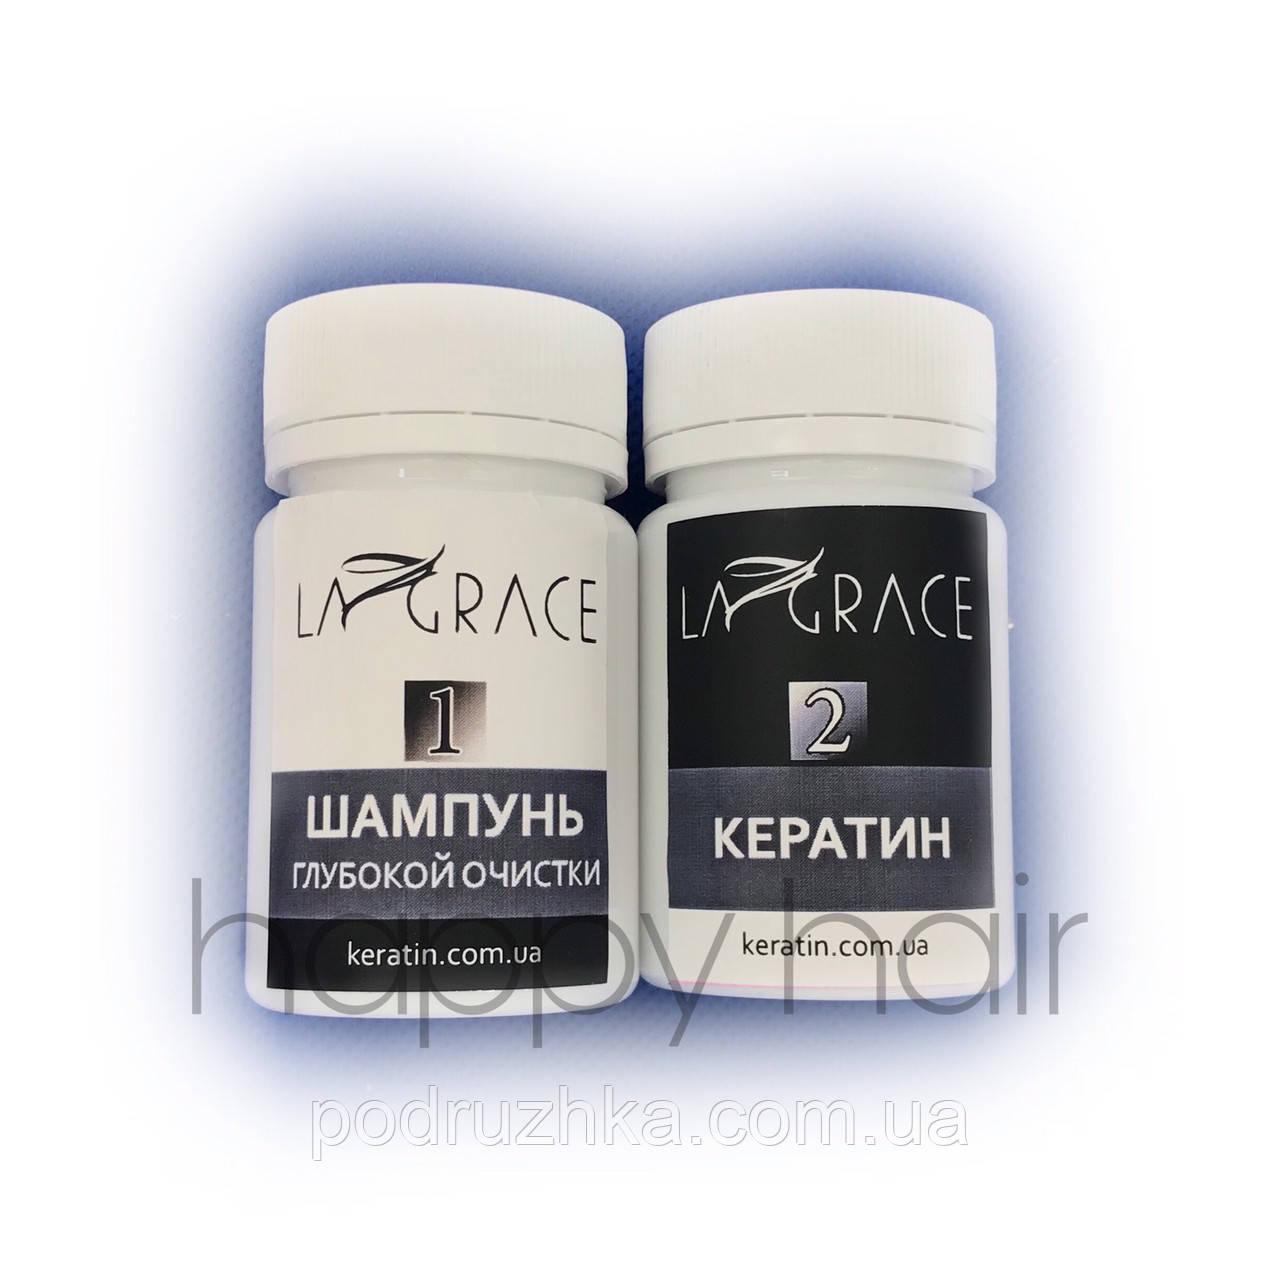 Набор для кератинового выравнивания волос LaGrace (шаг 2) 2х100 г